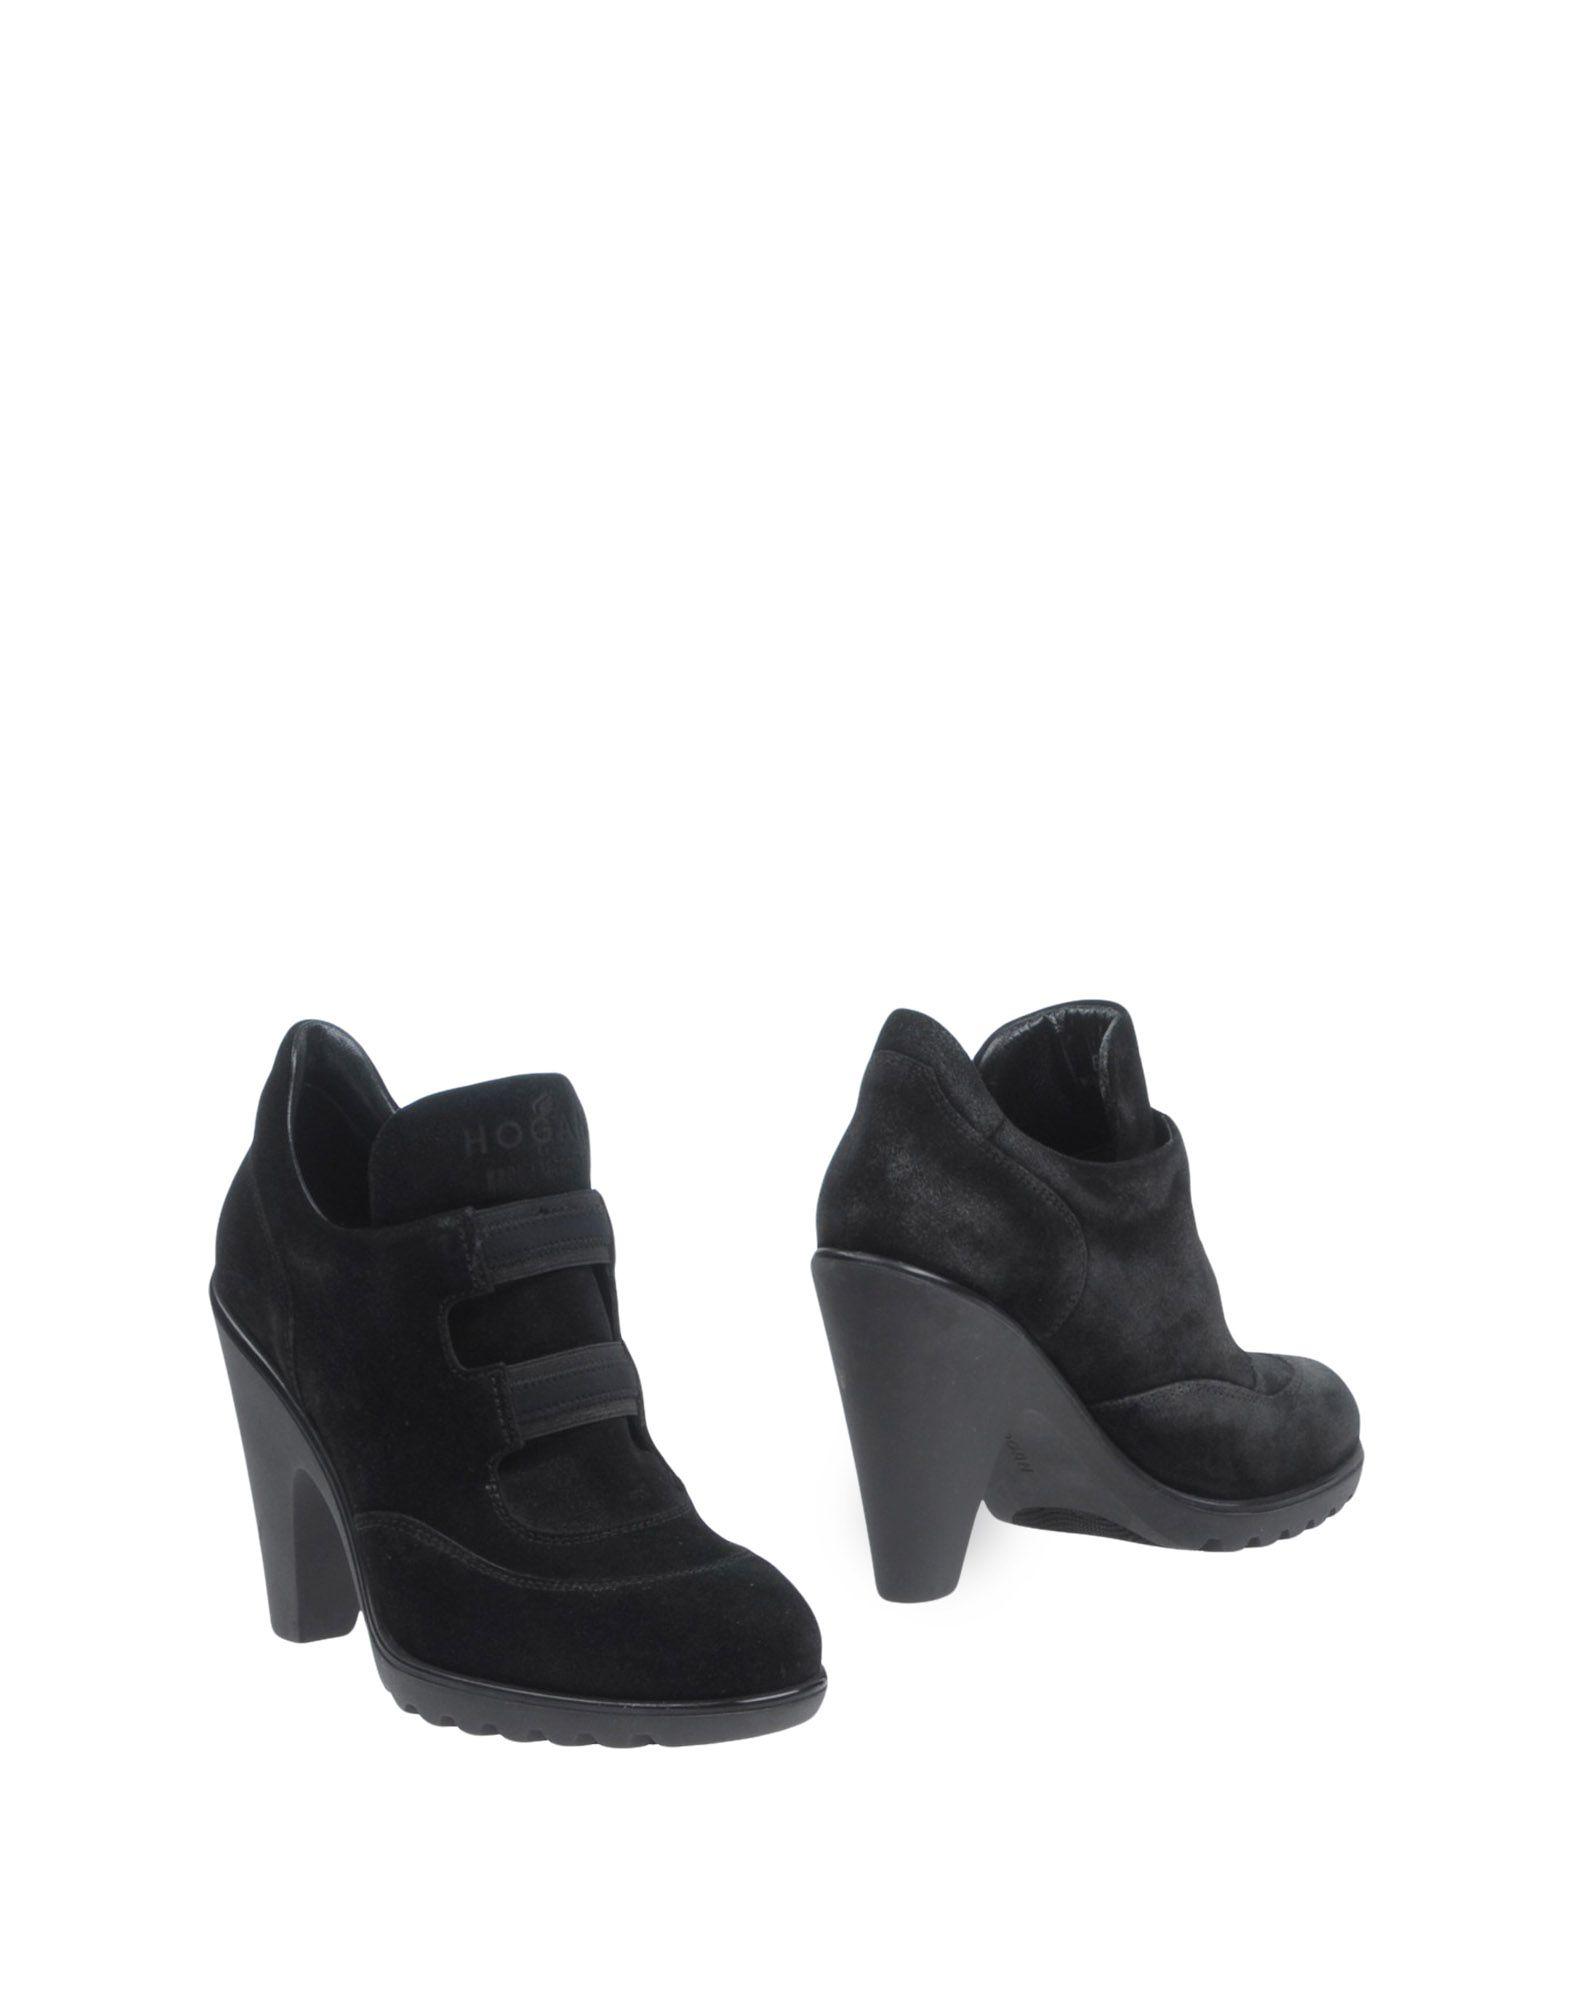 HOGAN by KARL LAGERFELD Ботинки цены онлайн